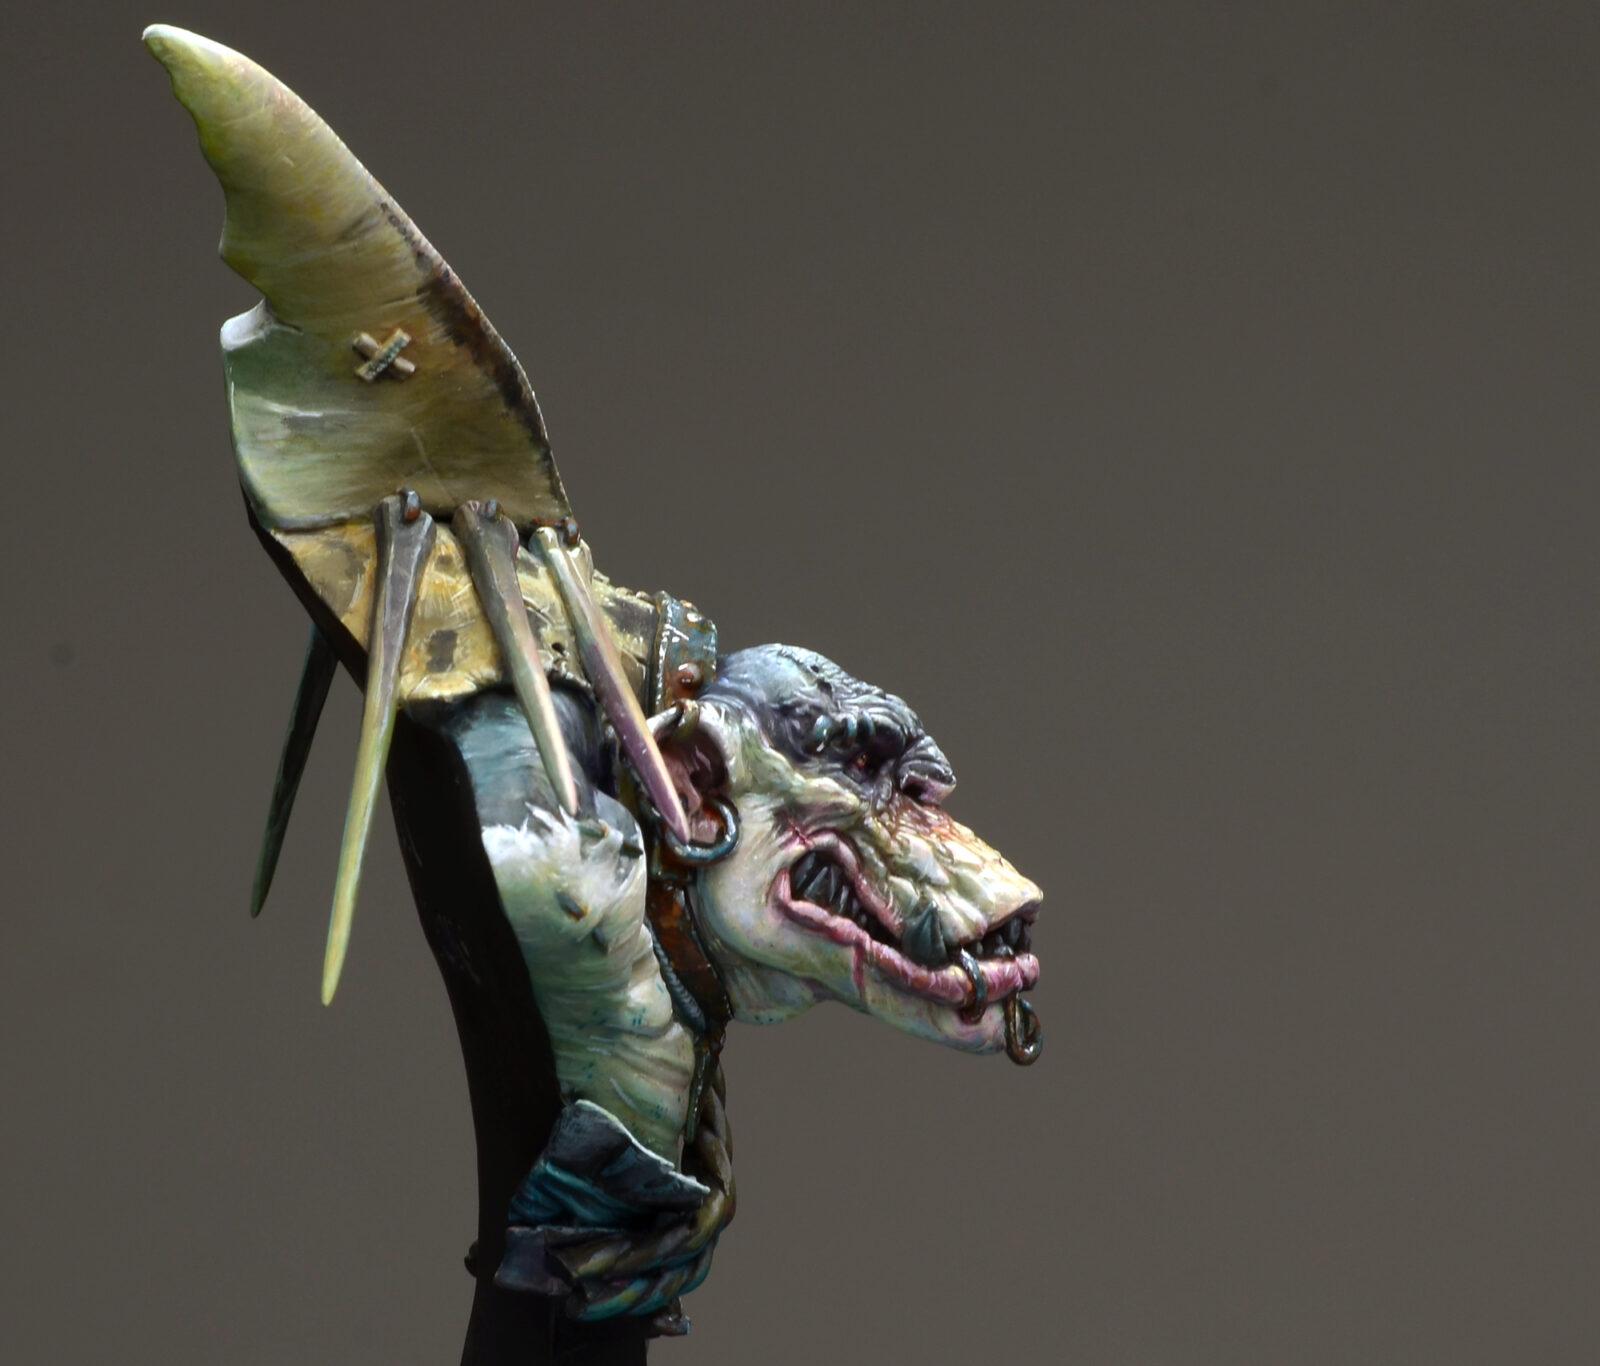 Sharky13